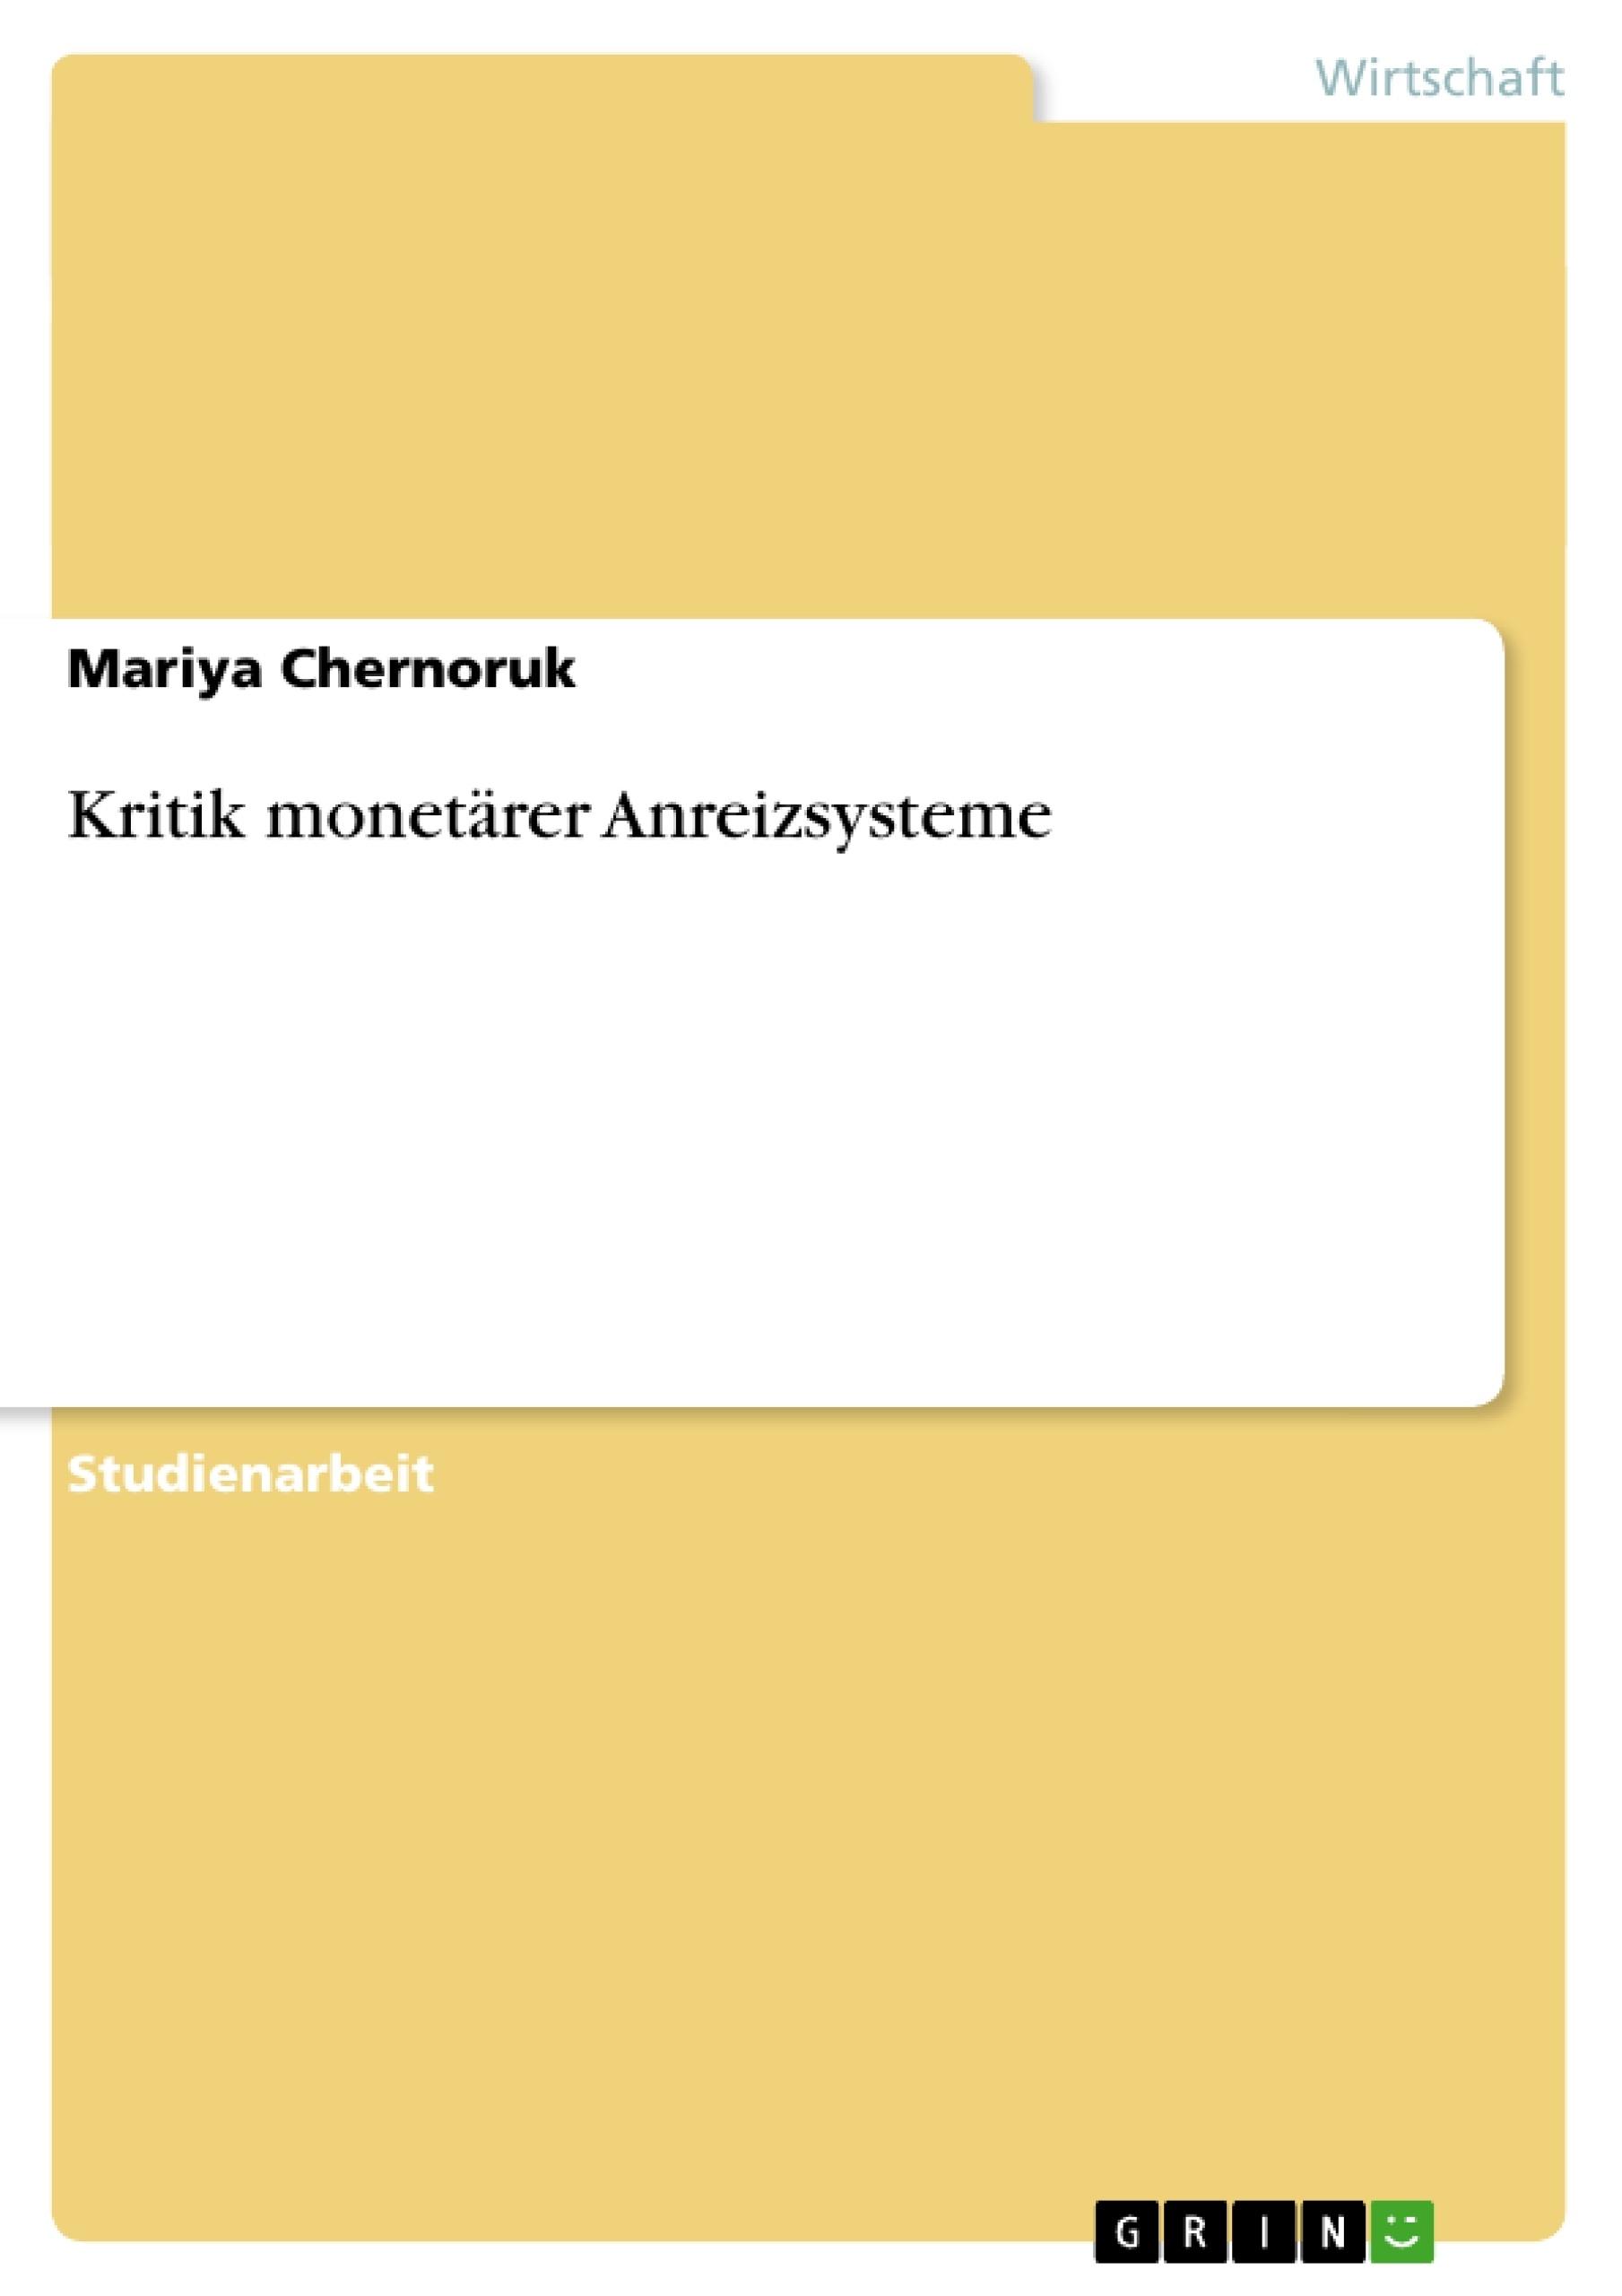 Titel: Kritik monetärer Anreizsysteme